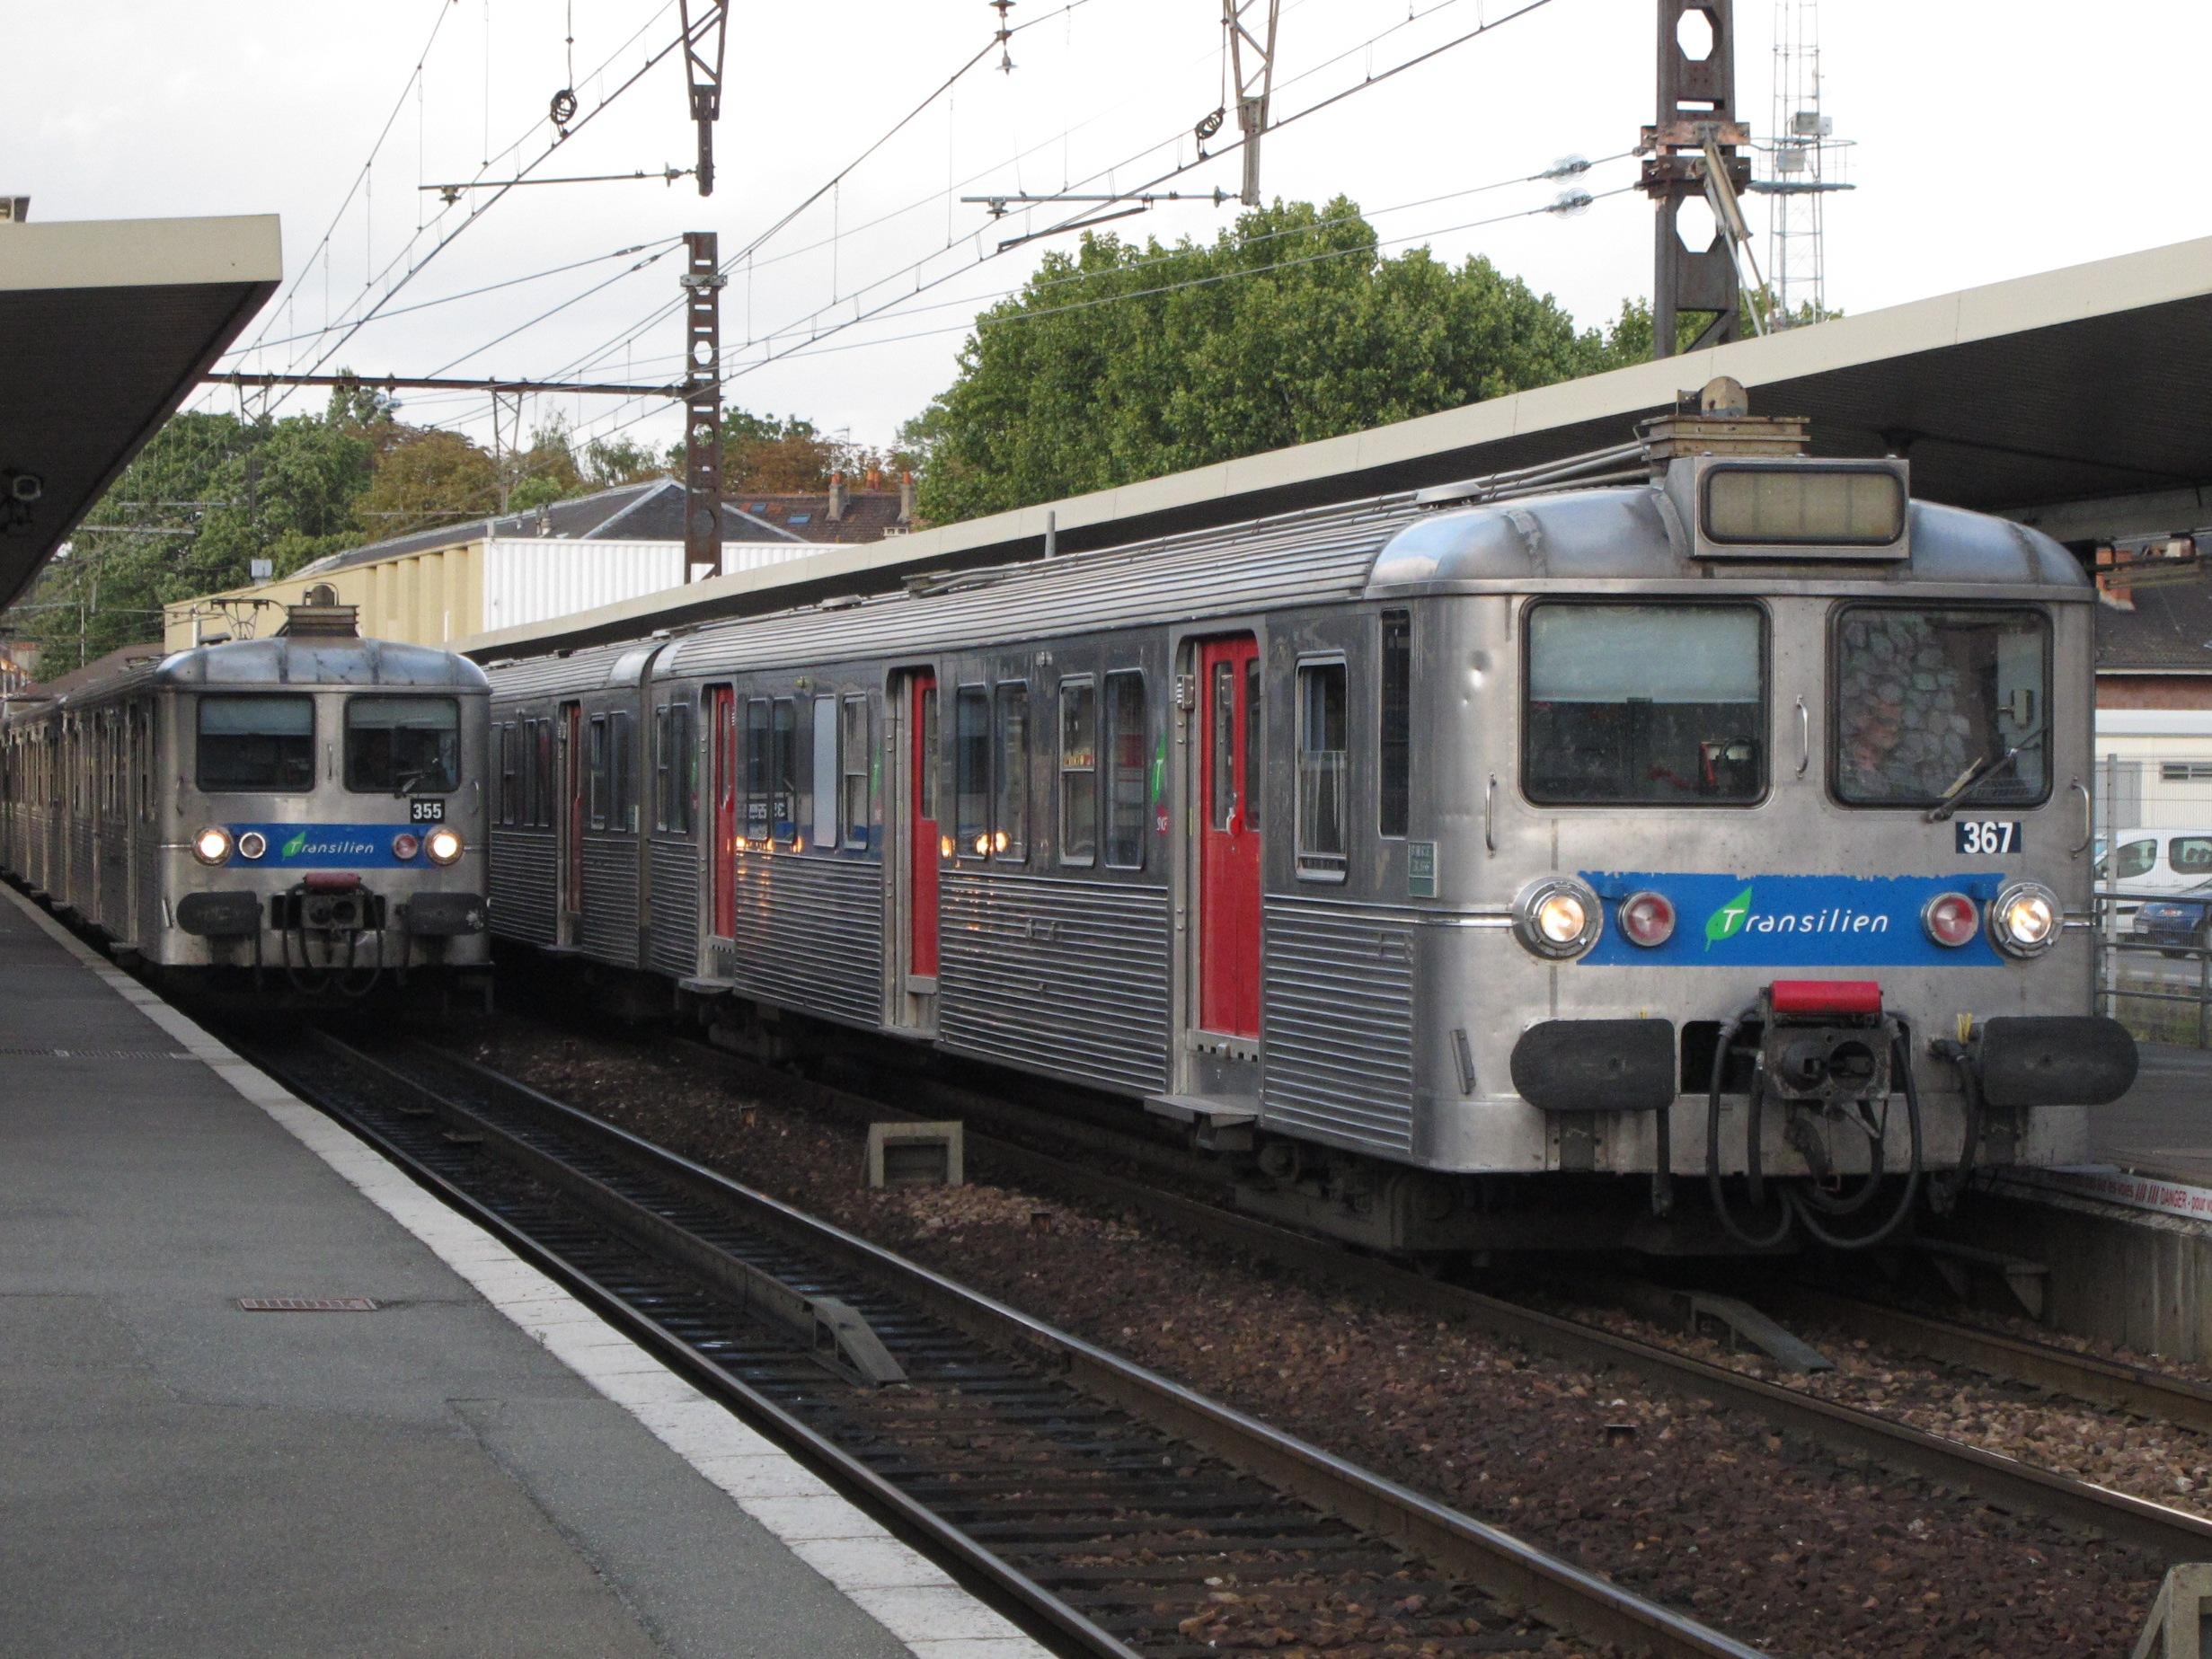 File:Z5300-Corbeil-Essonnes IMG 0671.JPG - Wikimedia Commons